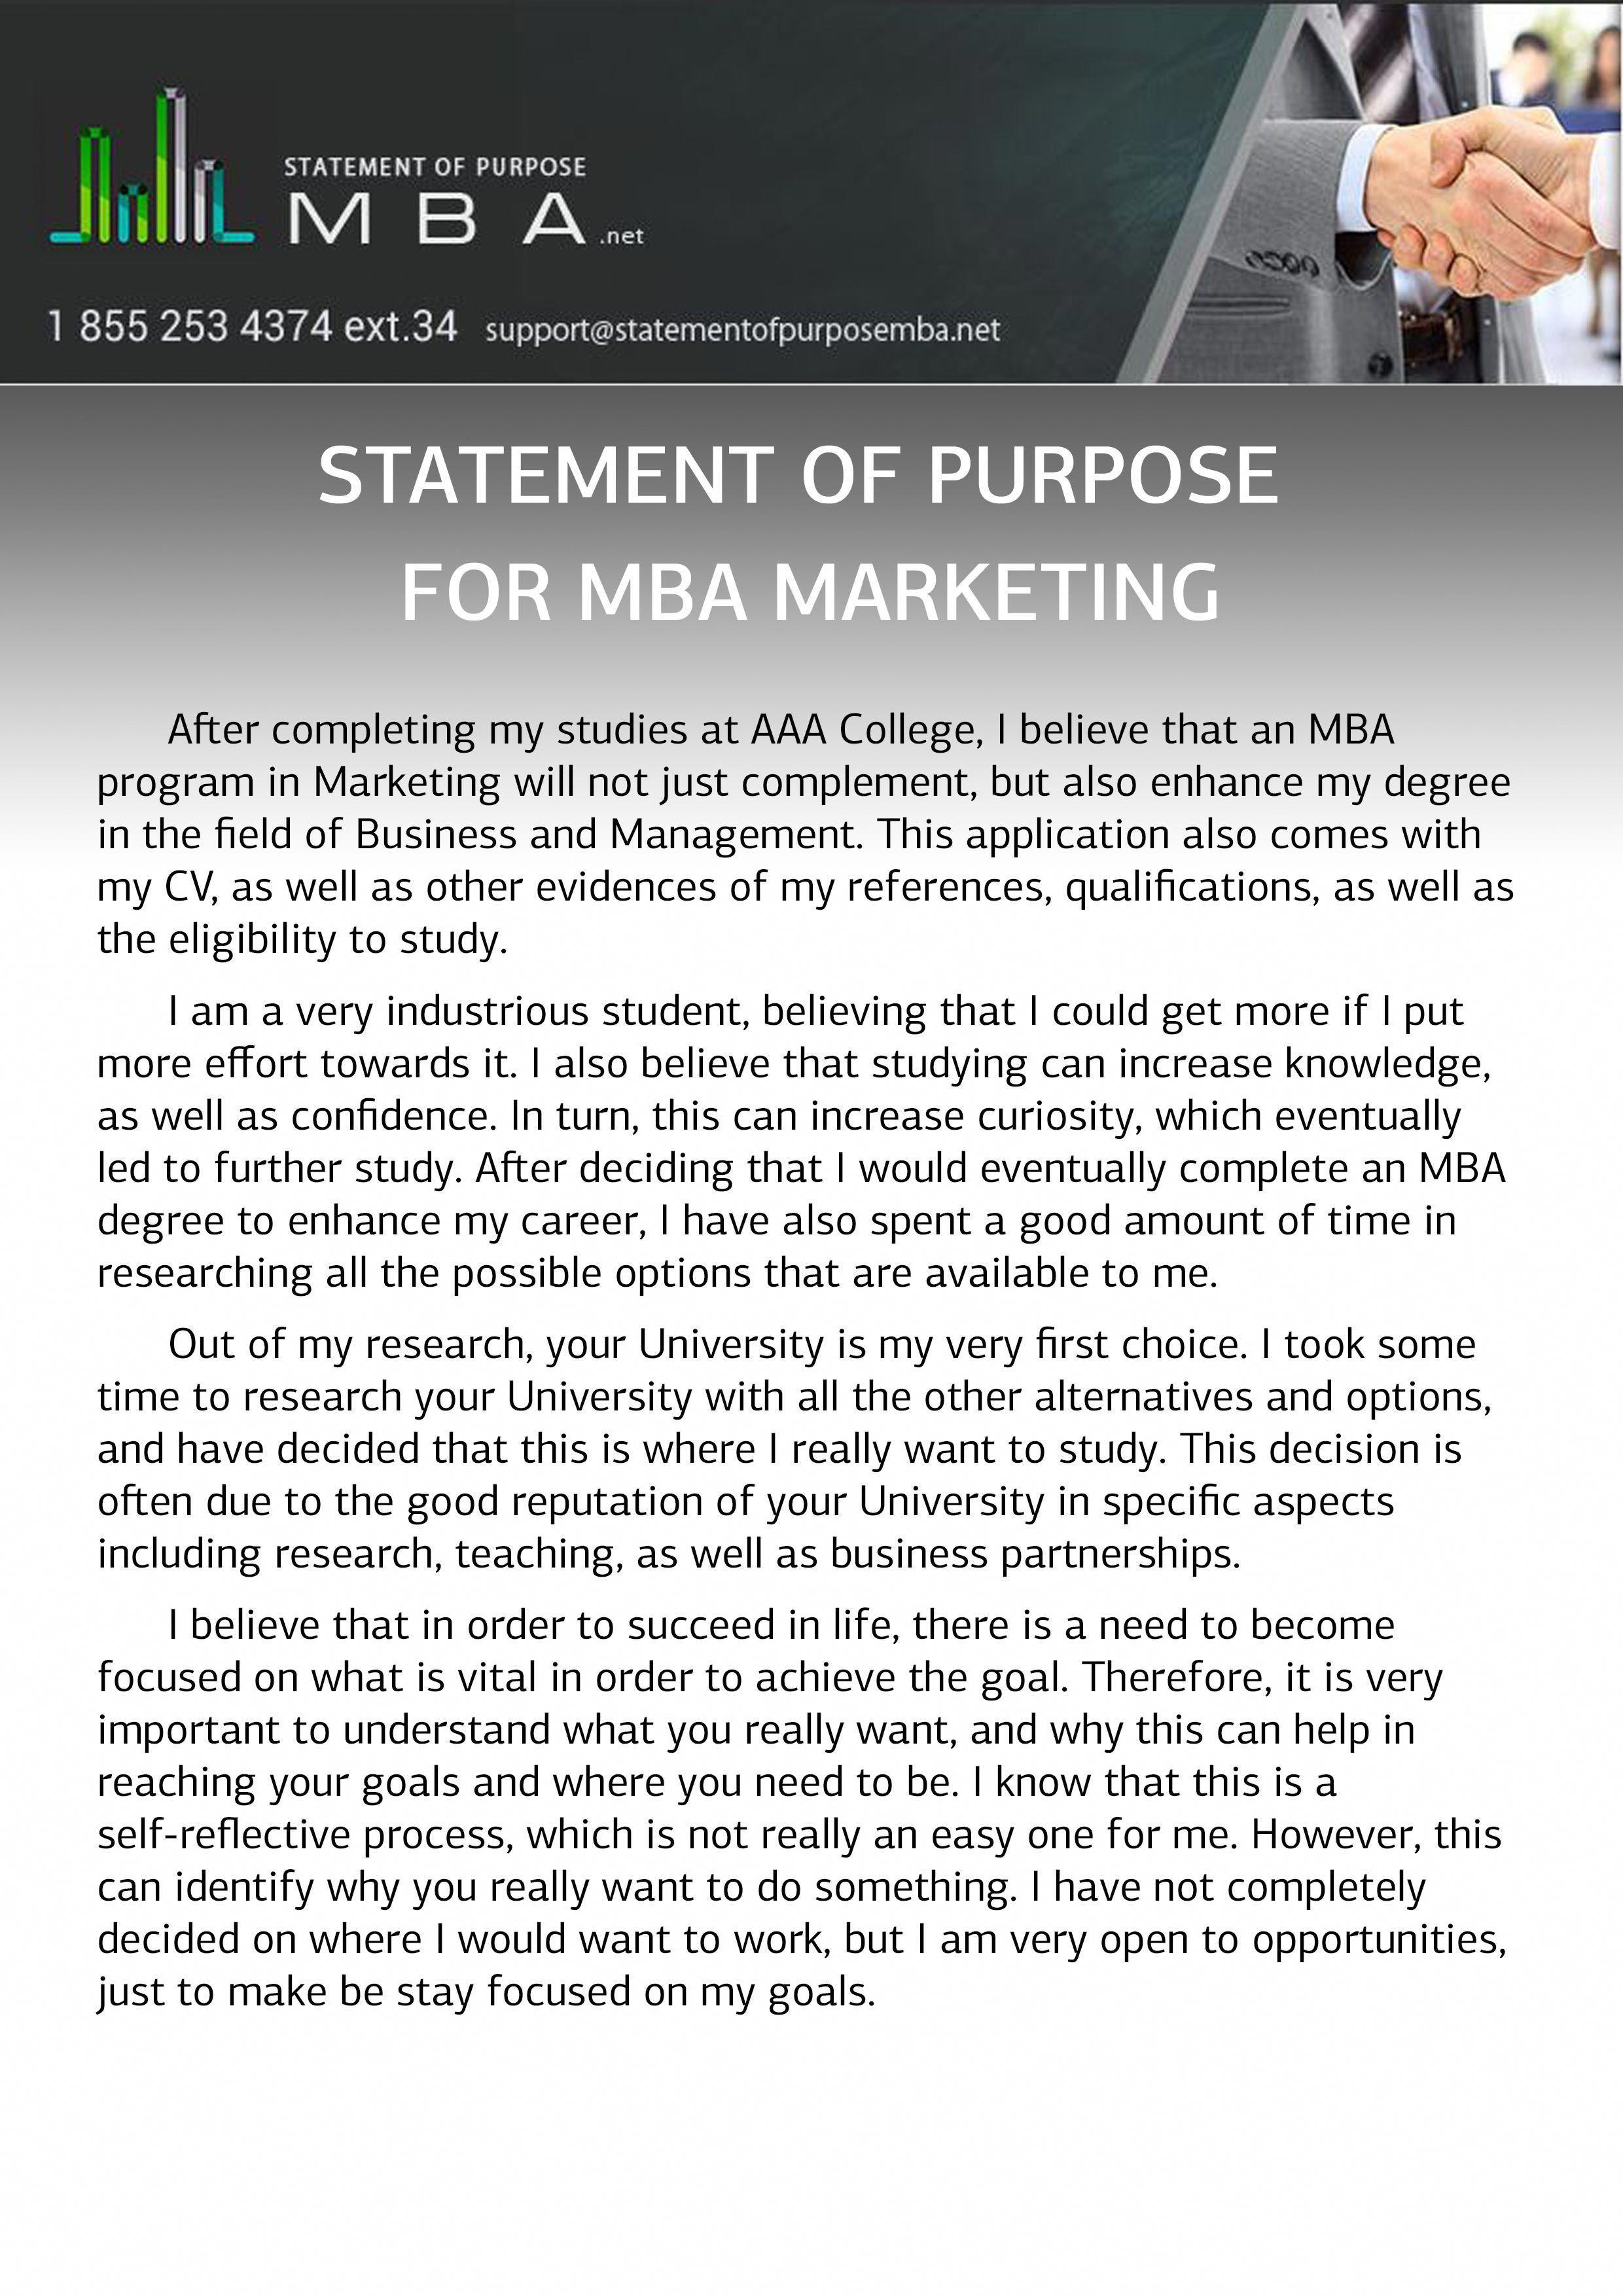 Harvard Busines School Capital Campaign Harvardbusinessschoolacceptancerate Academic Essay Writing Scholarship Help Example Referencing Style Website